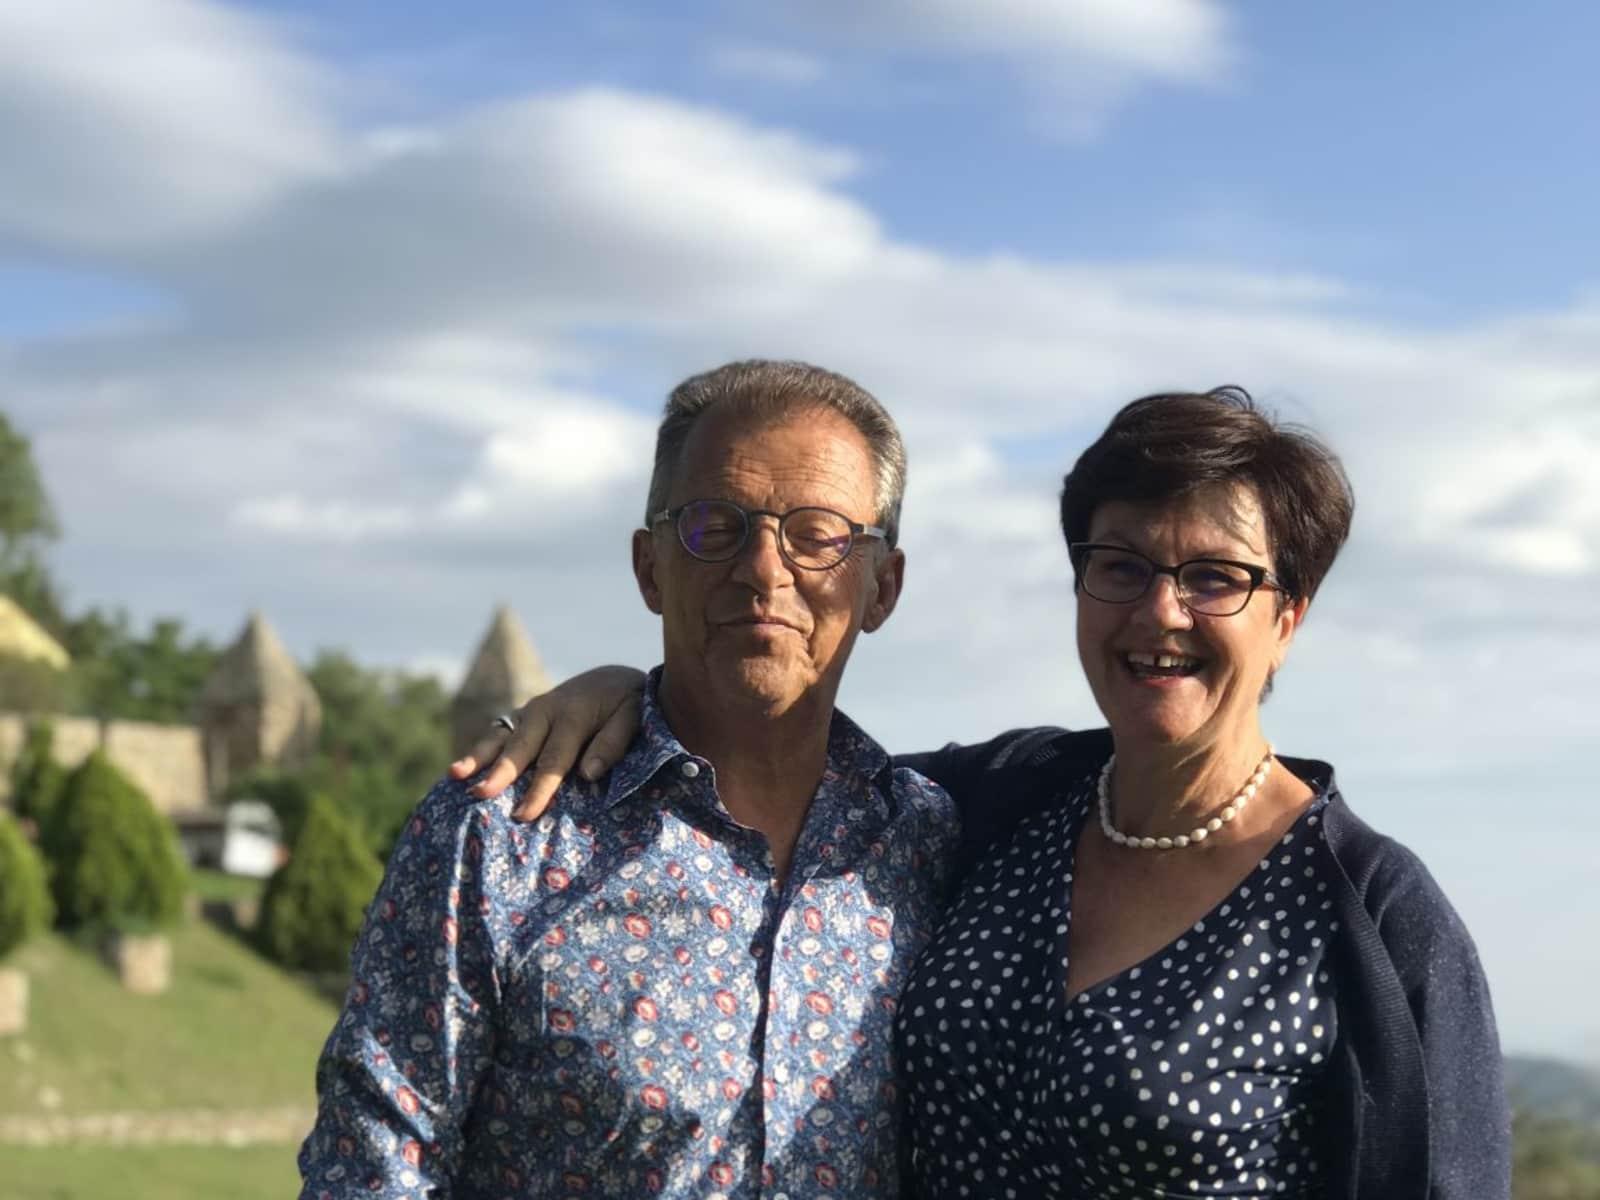 Christian & Christine from Paris, France